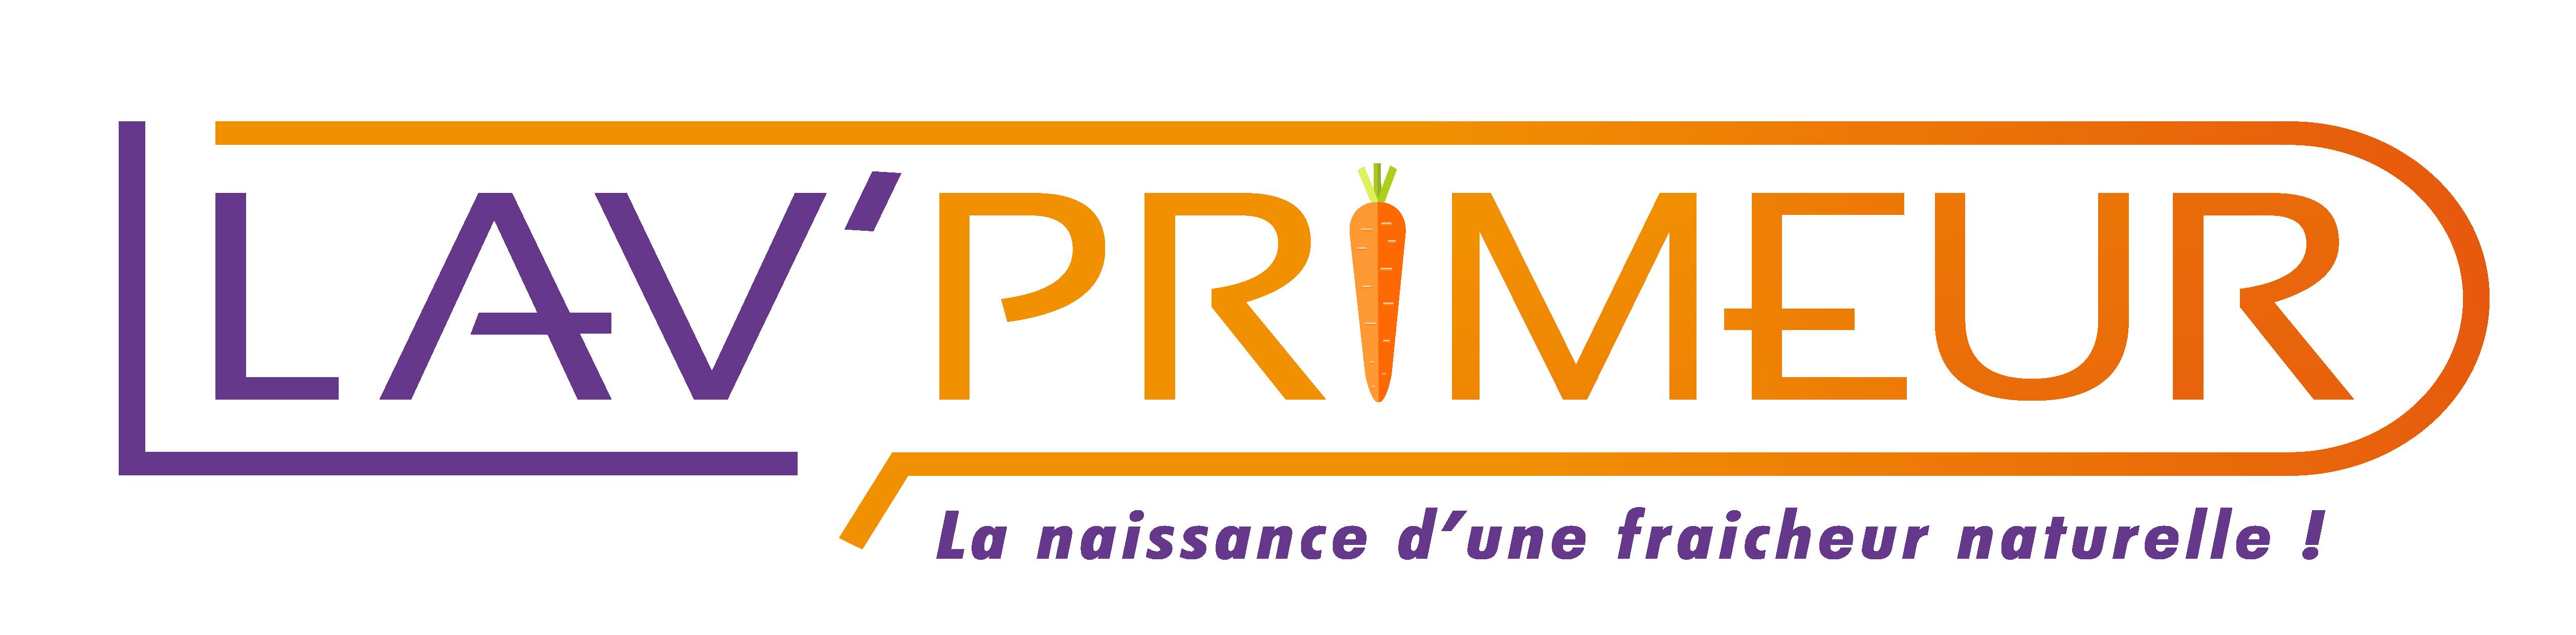 LAV PRIMEUR